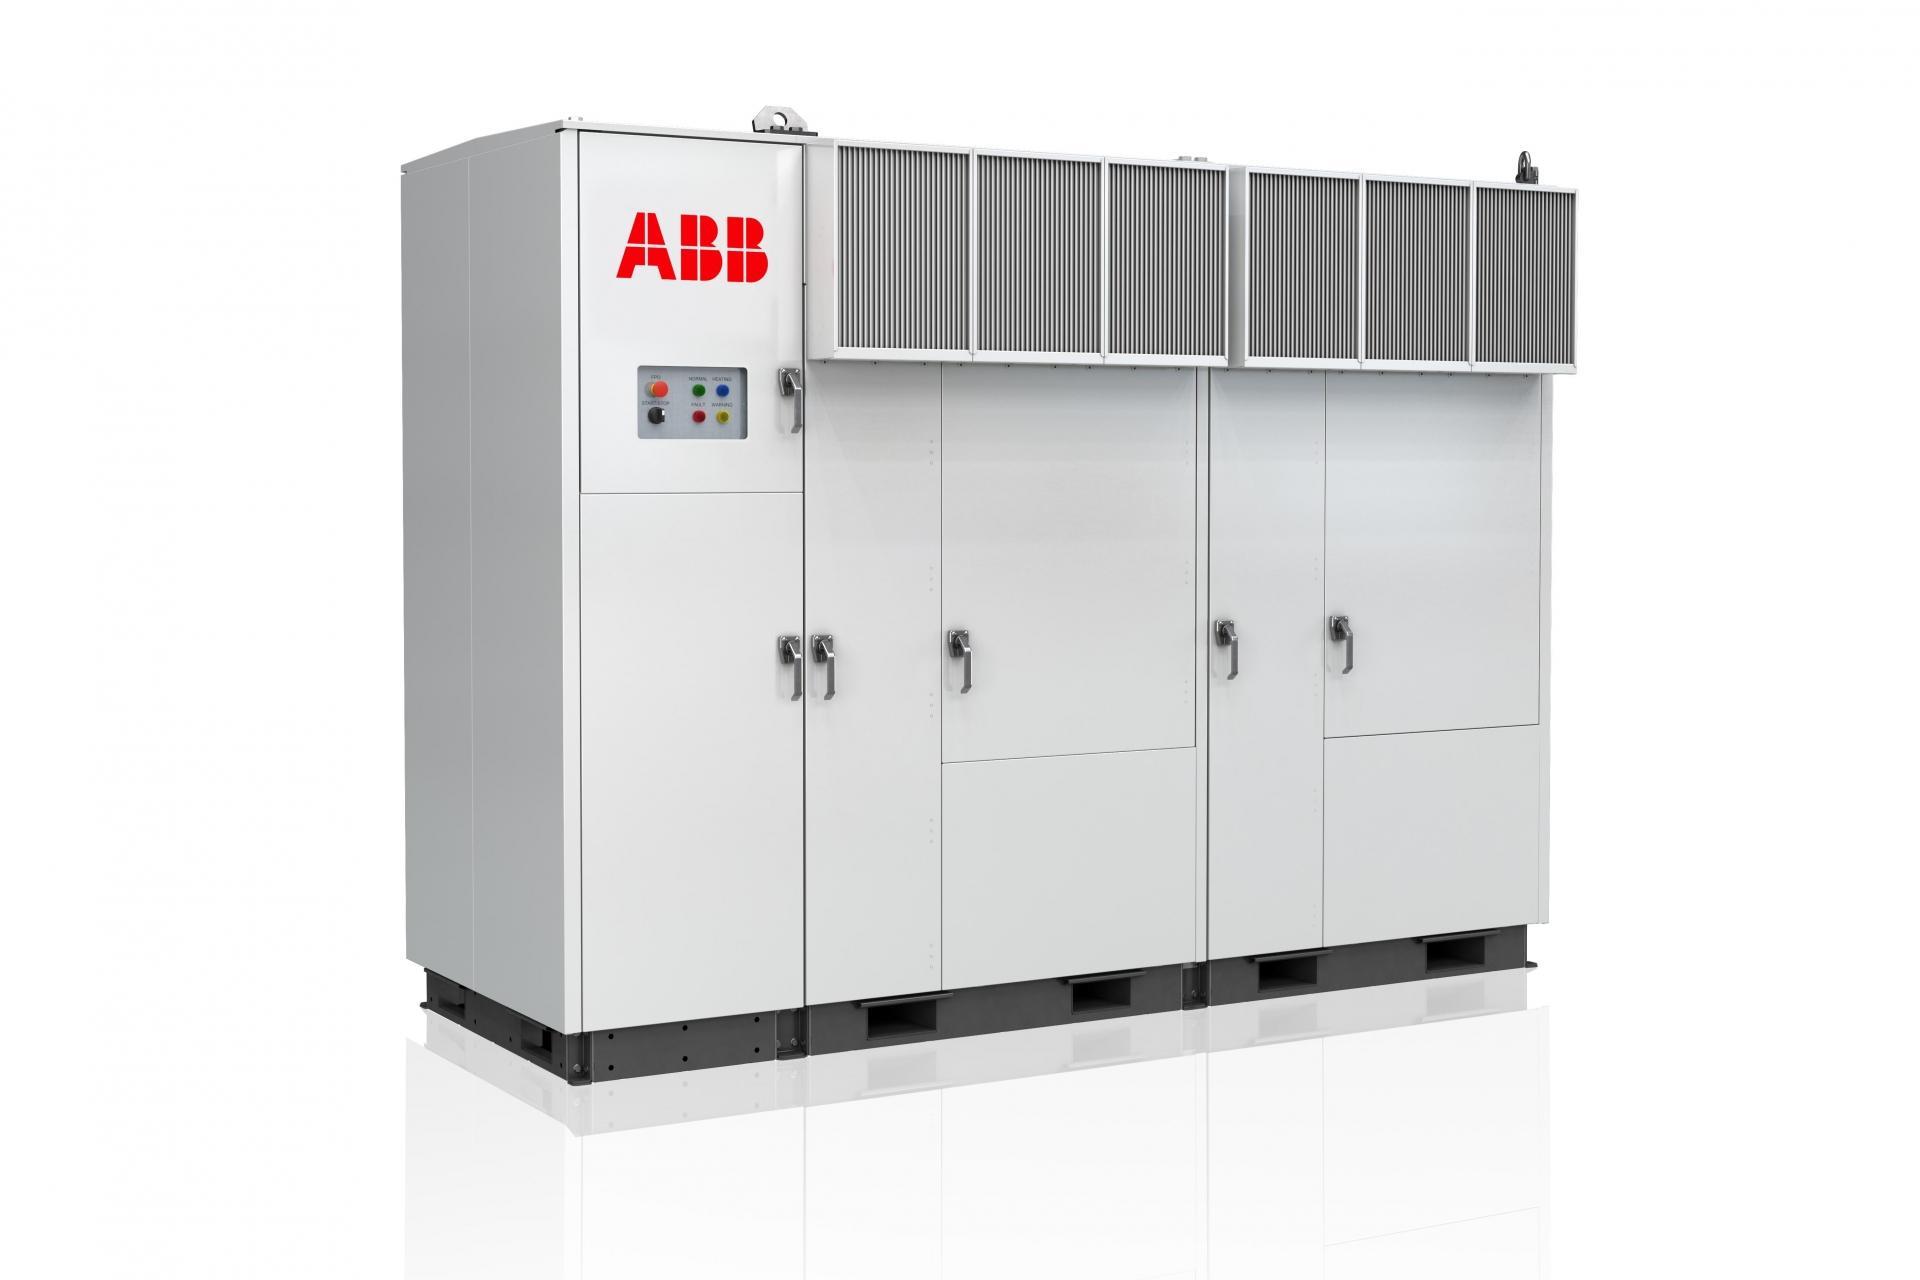 Read more about the article Анализ влияния коэффициента загрузки асинхронных двигателей на потребление реактивной мощности